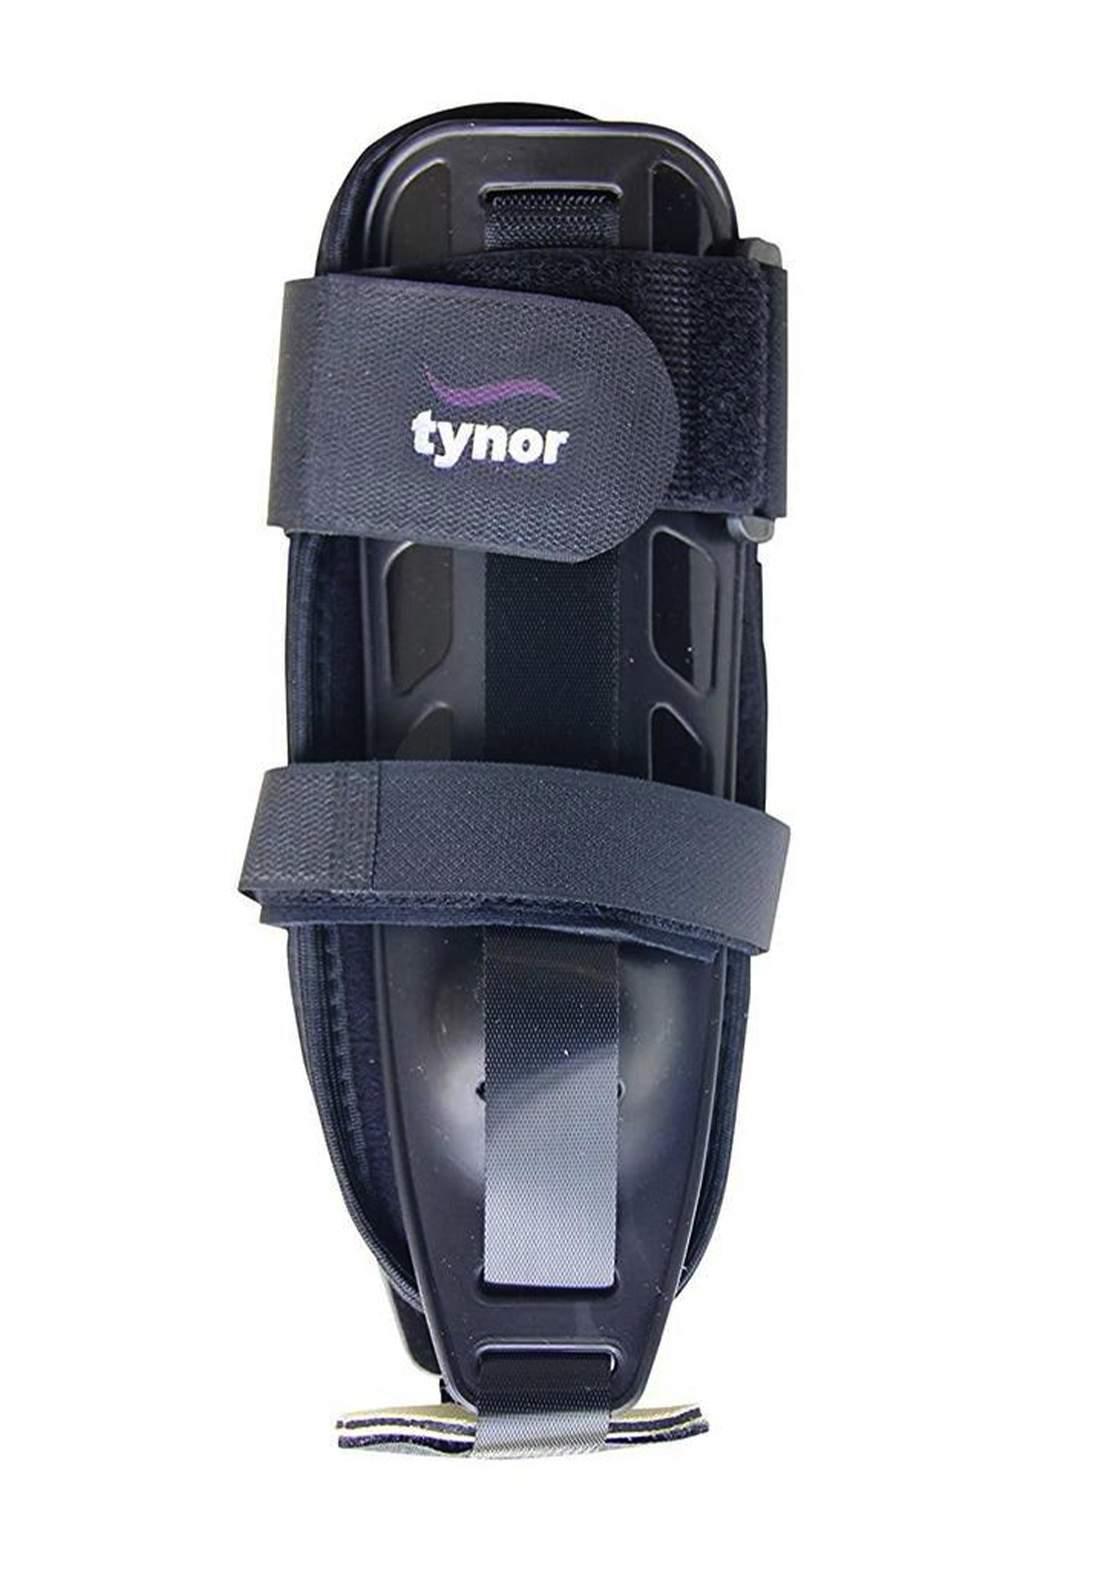 Tynor D-26 Ankle Splint جبيرة للكاحل